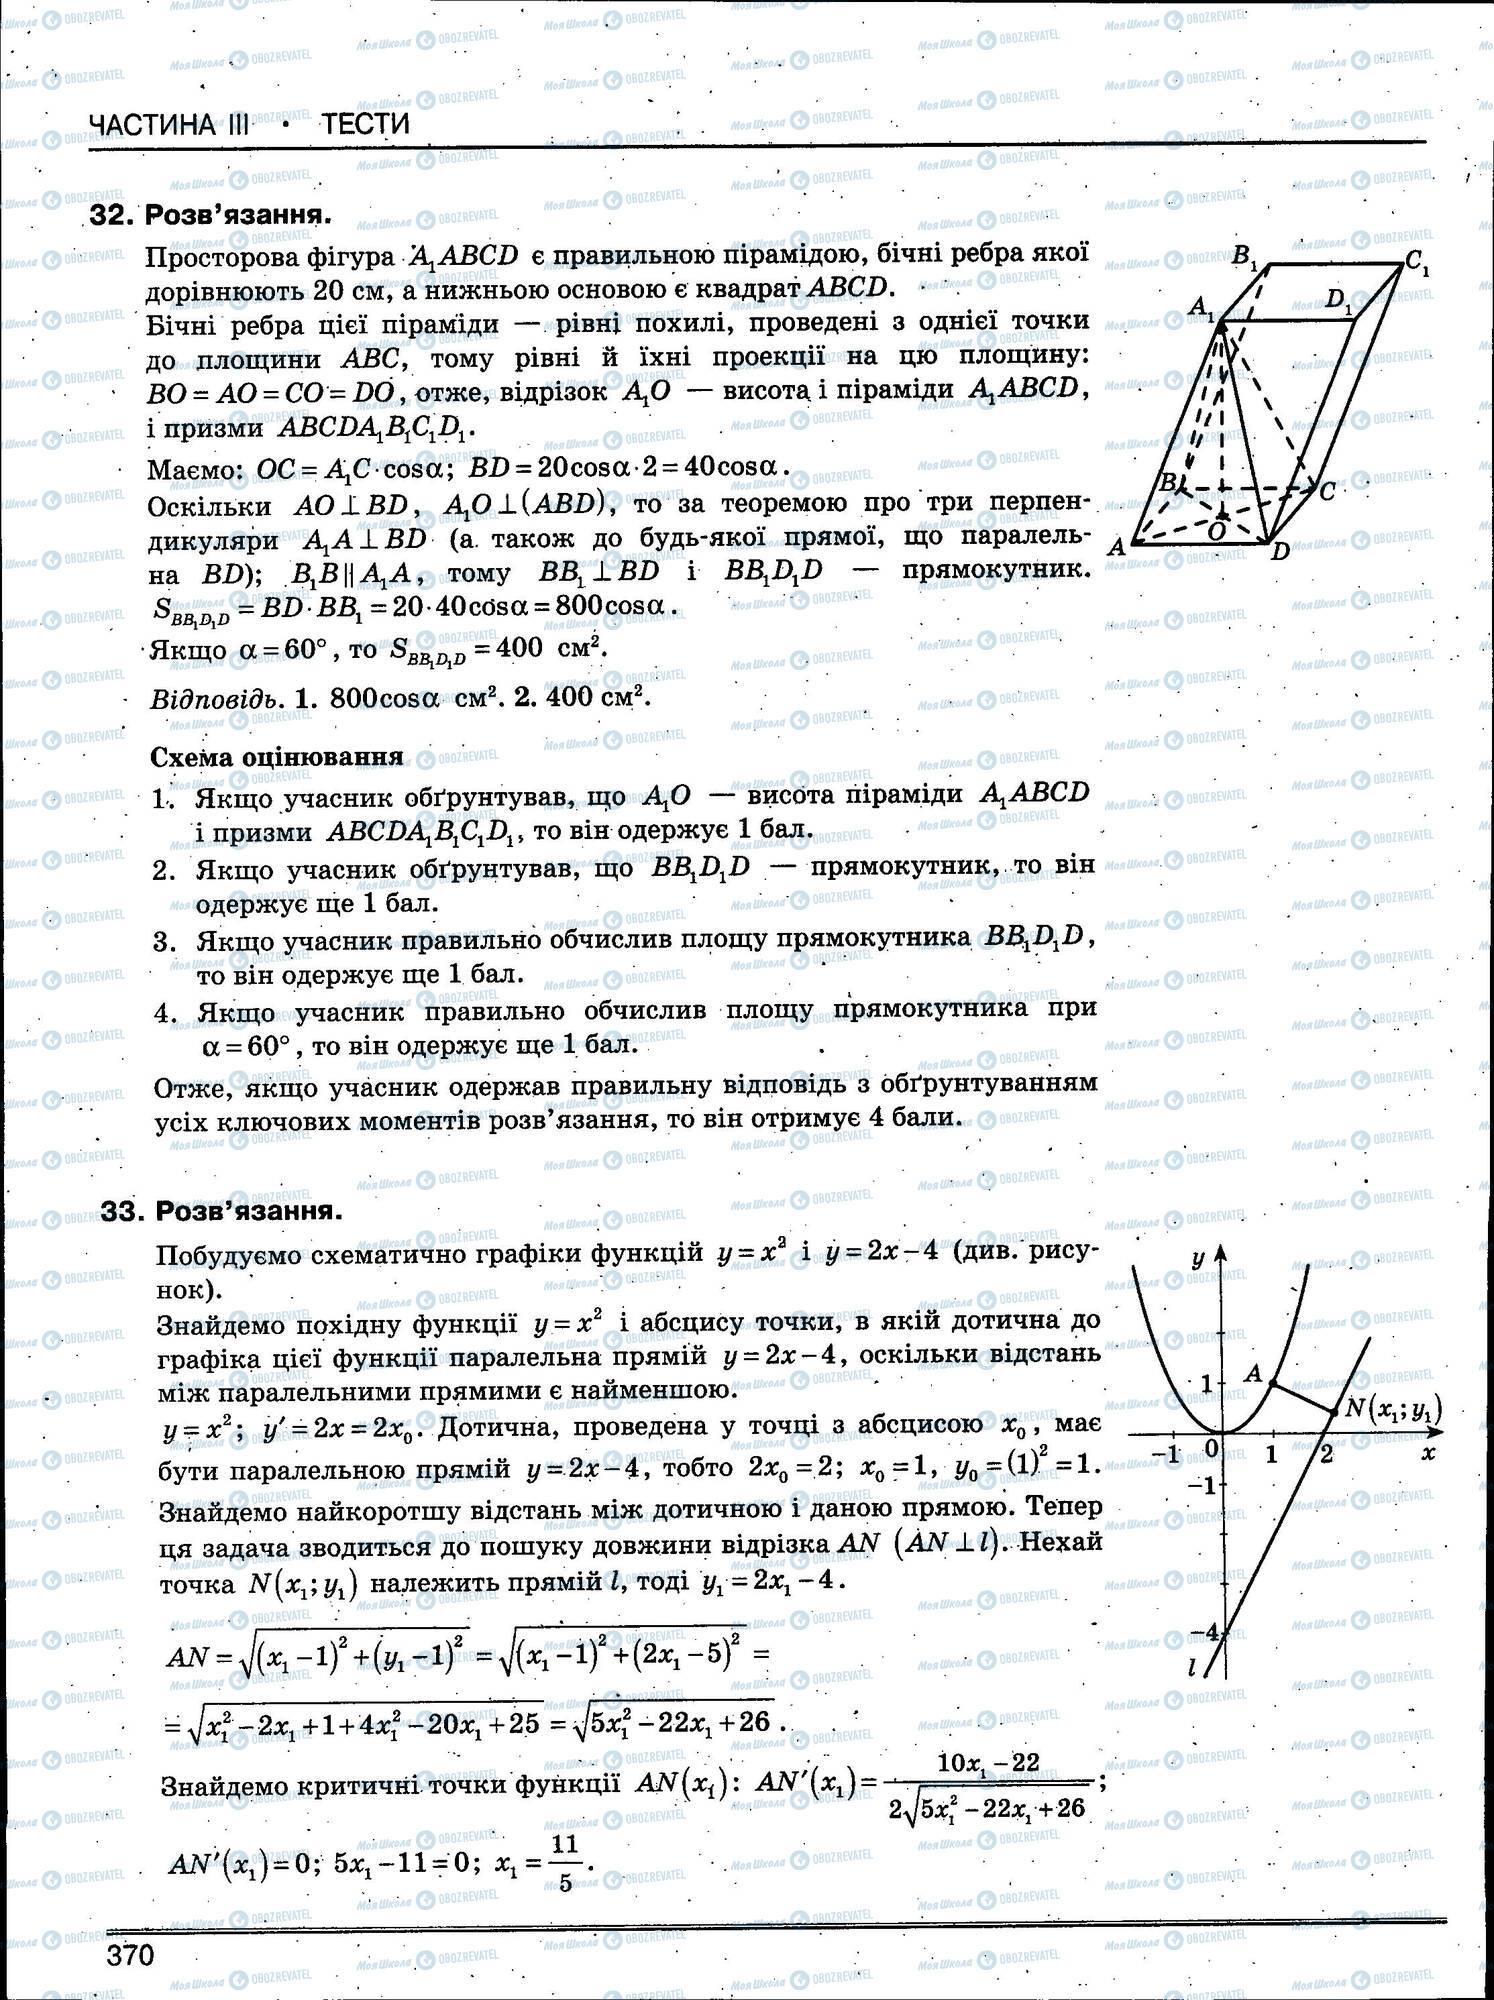 ЗНО Математика 11 класс страница 370